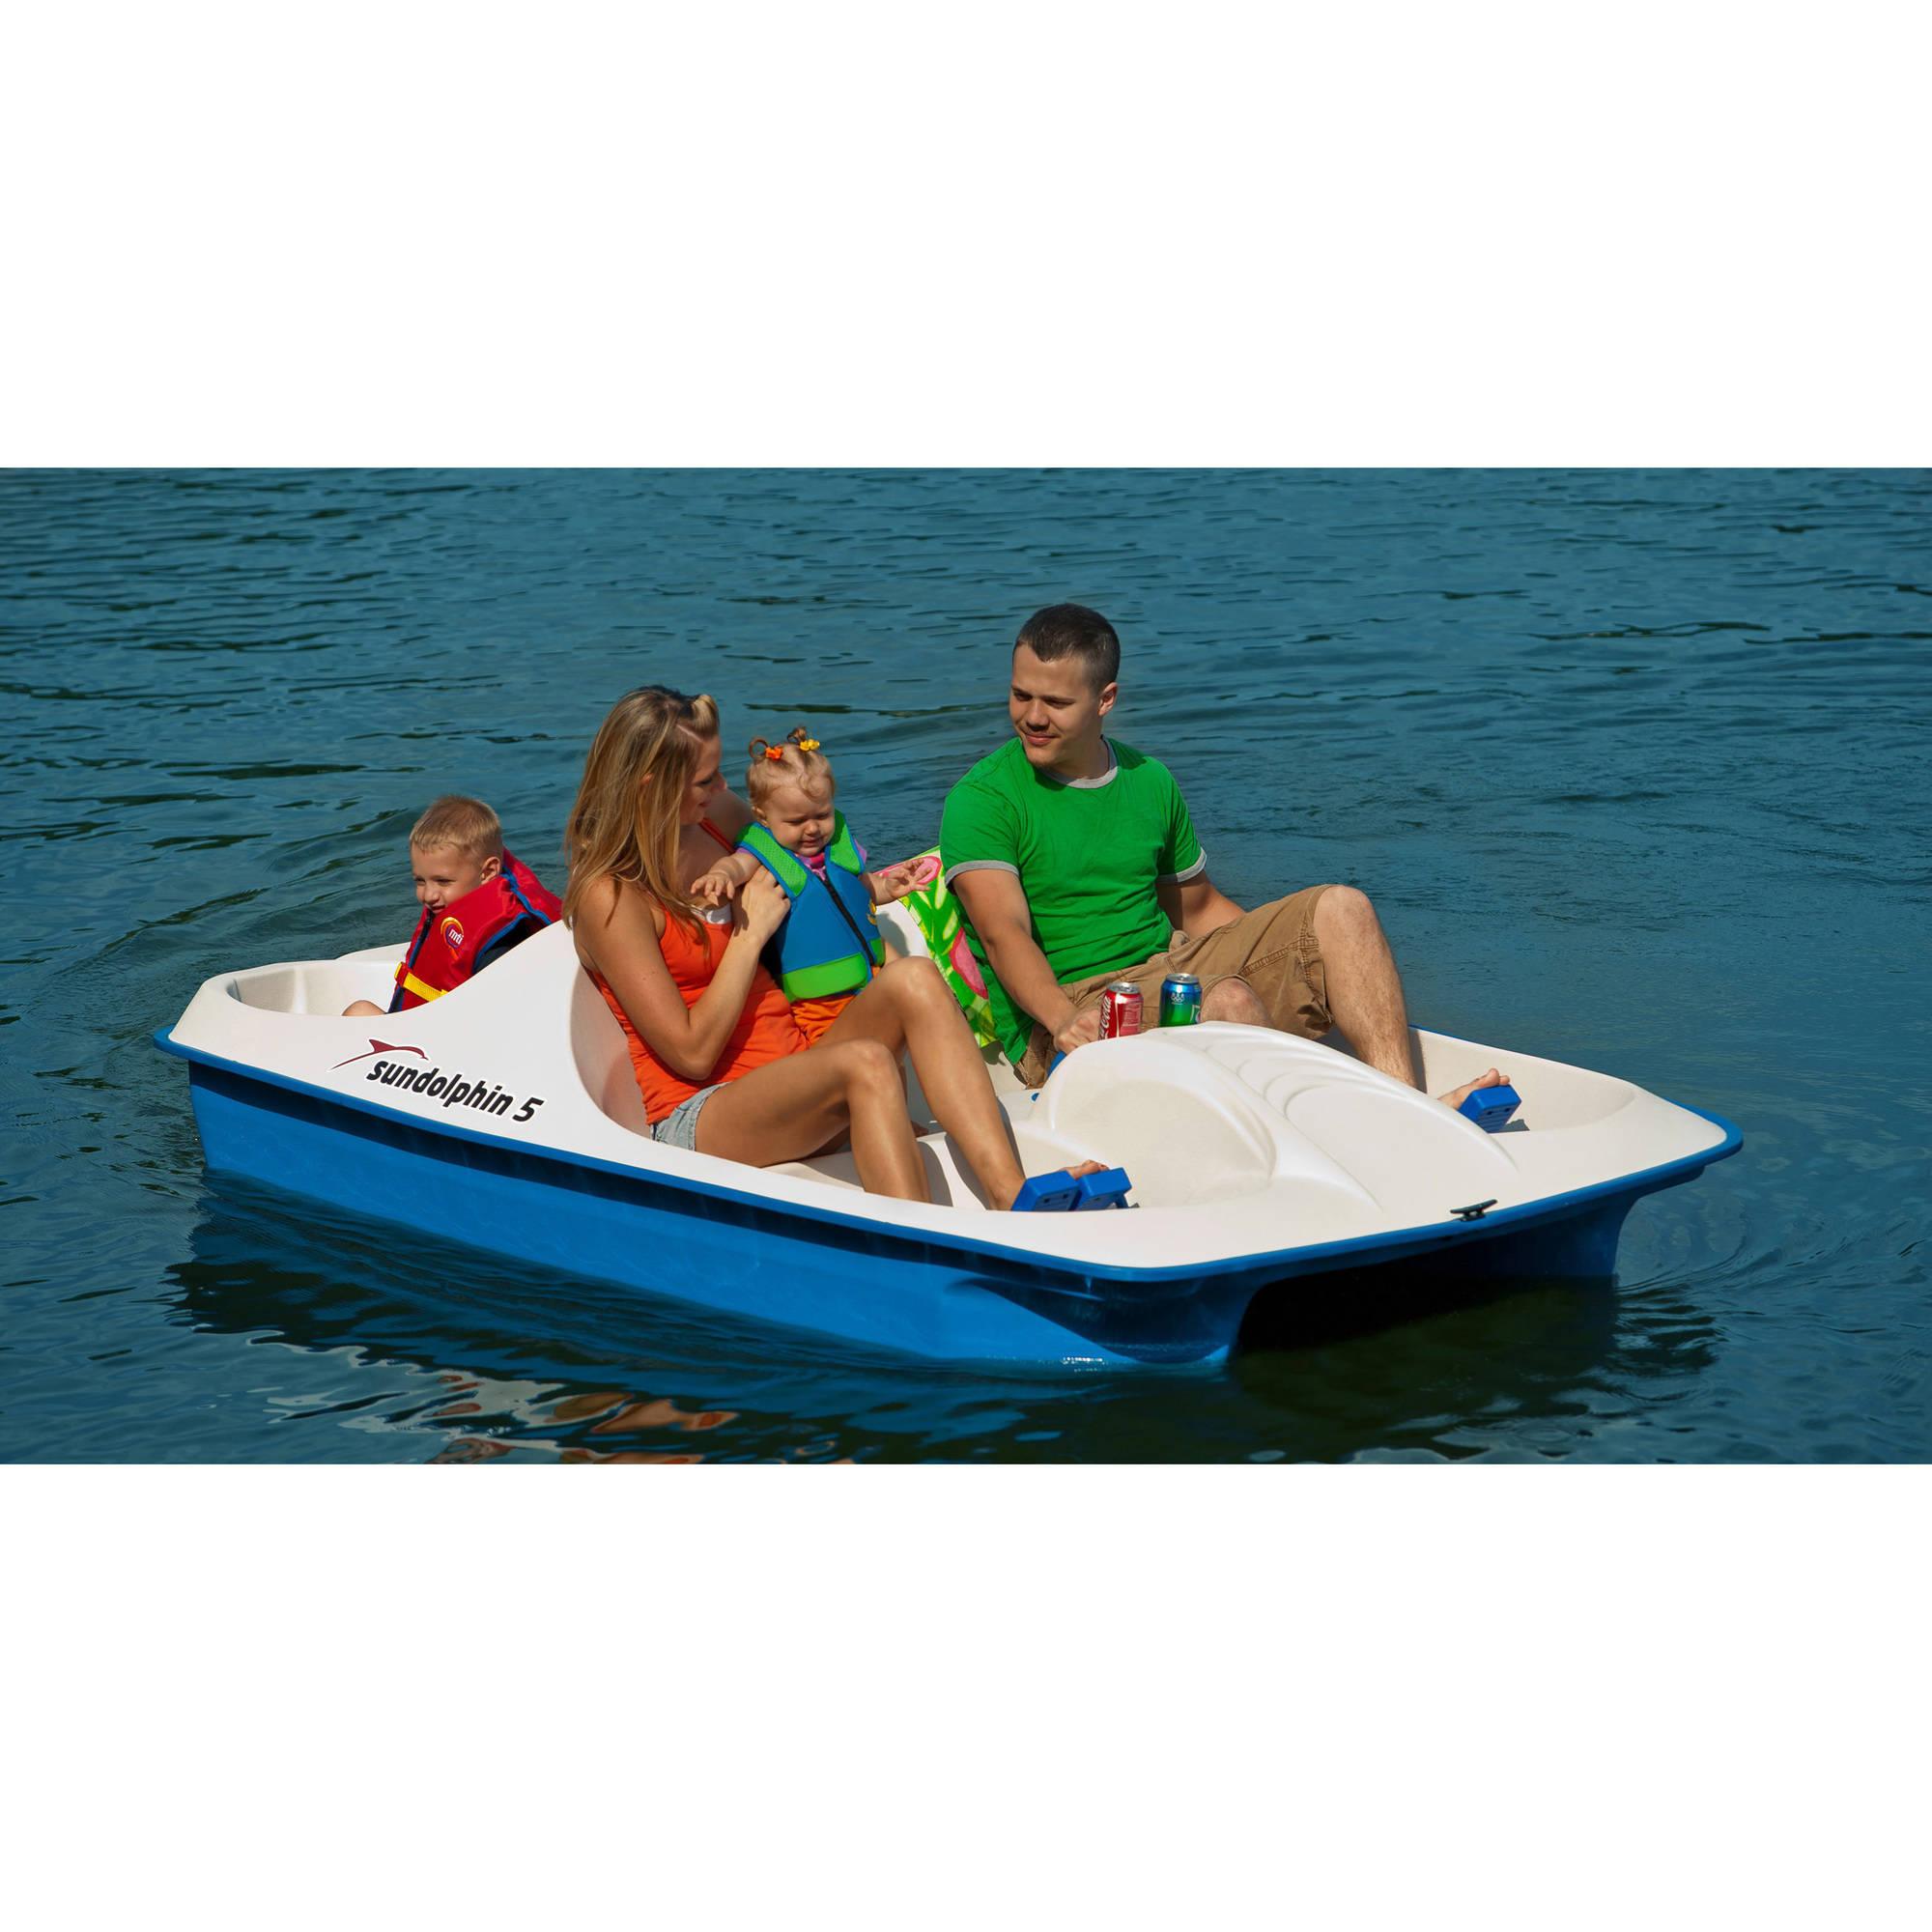 Sun Dolphin 5 Seat Pedal Boat - Walmart.com